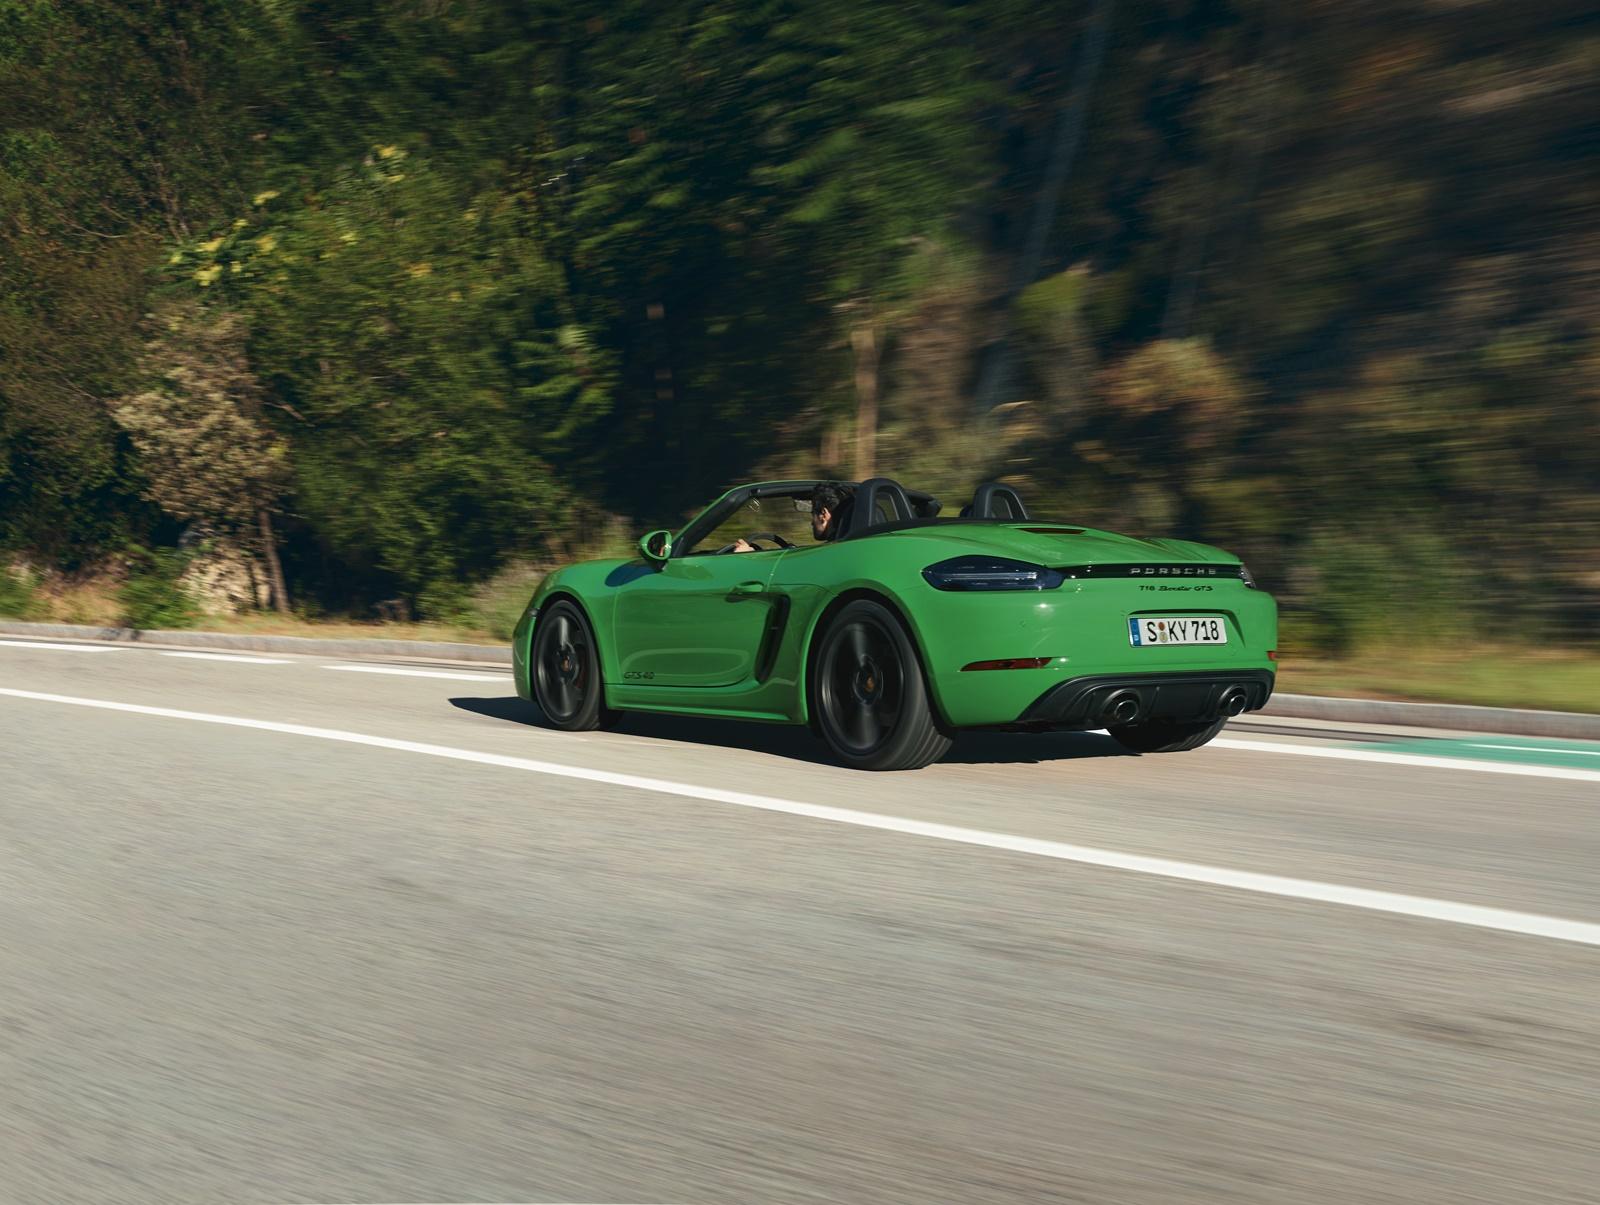 Neuvorstellung Porsche 718 Boxster/Cayman GTS: Mit sechs Zylindern gekrönt